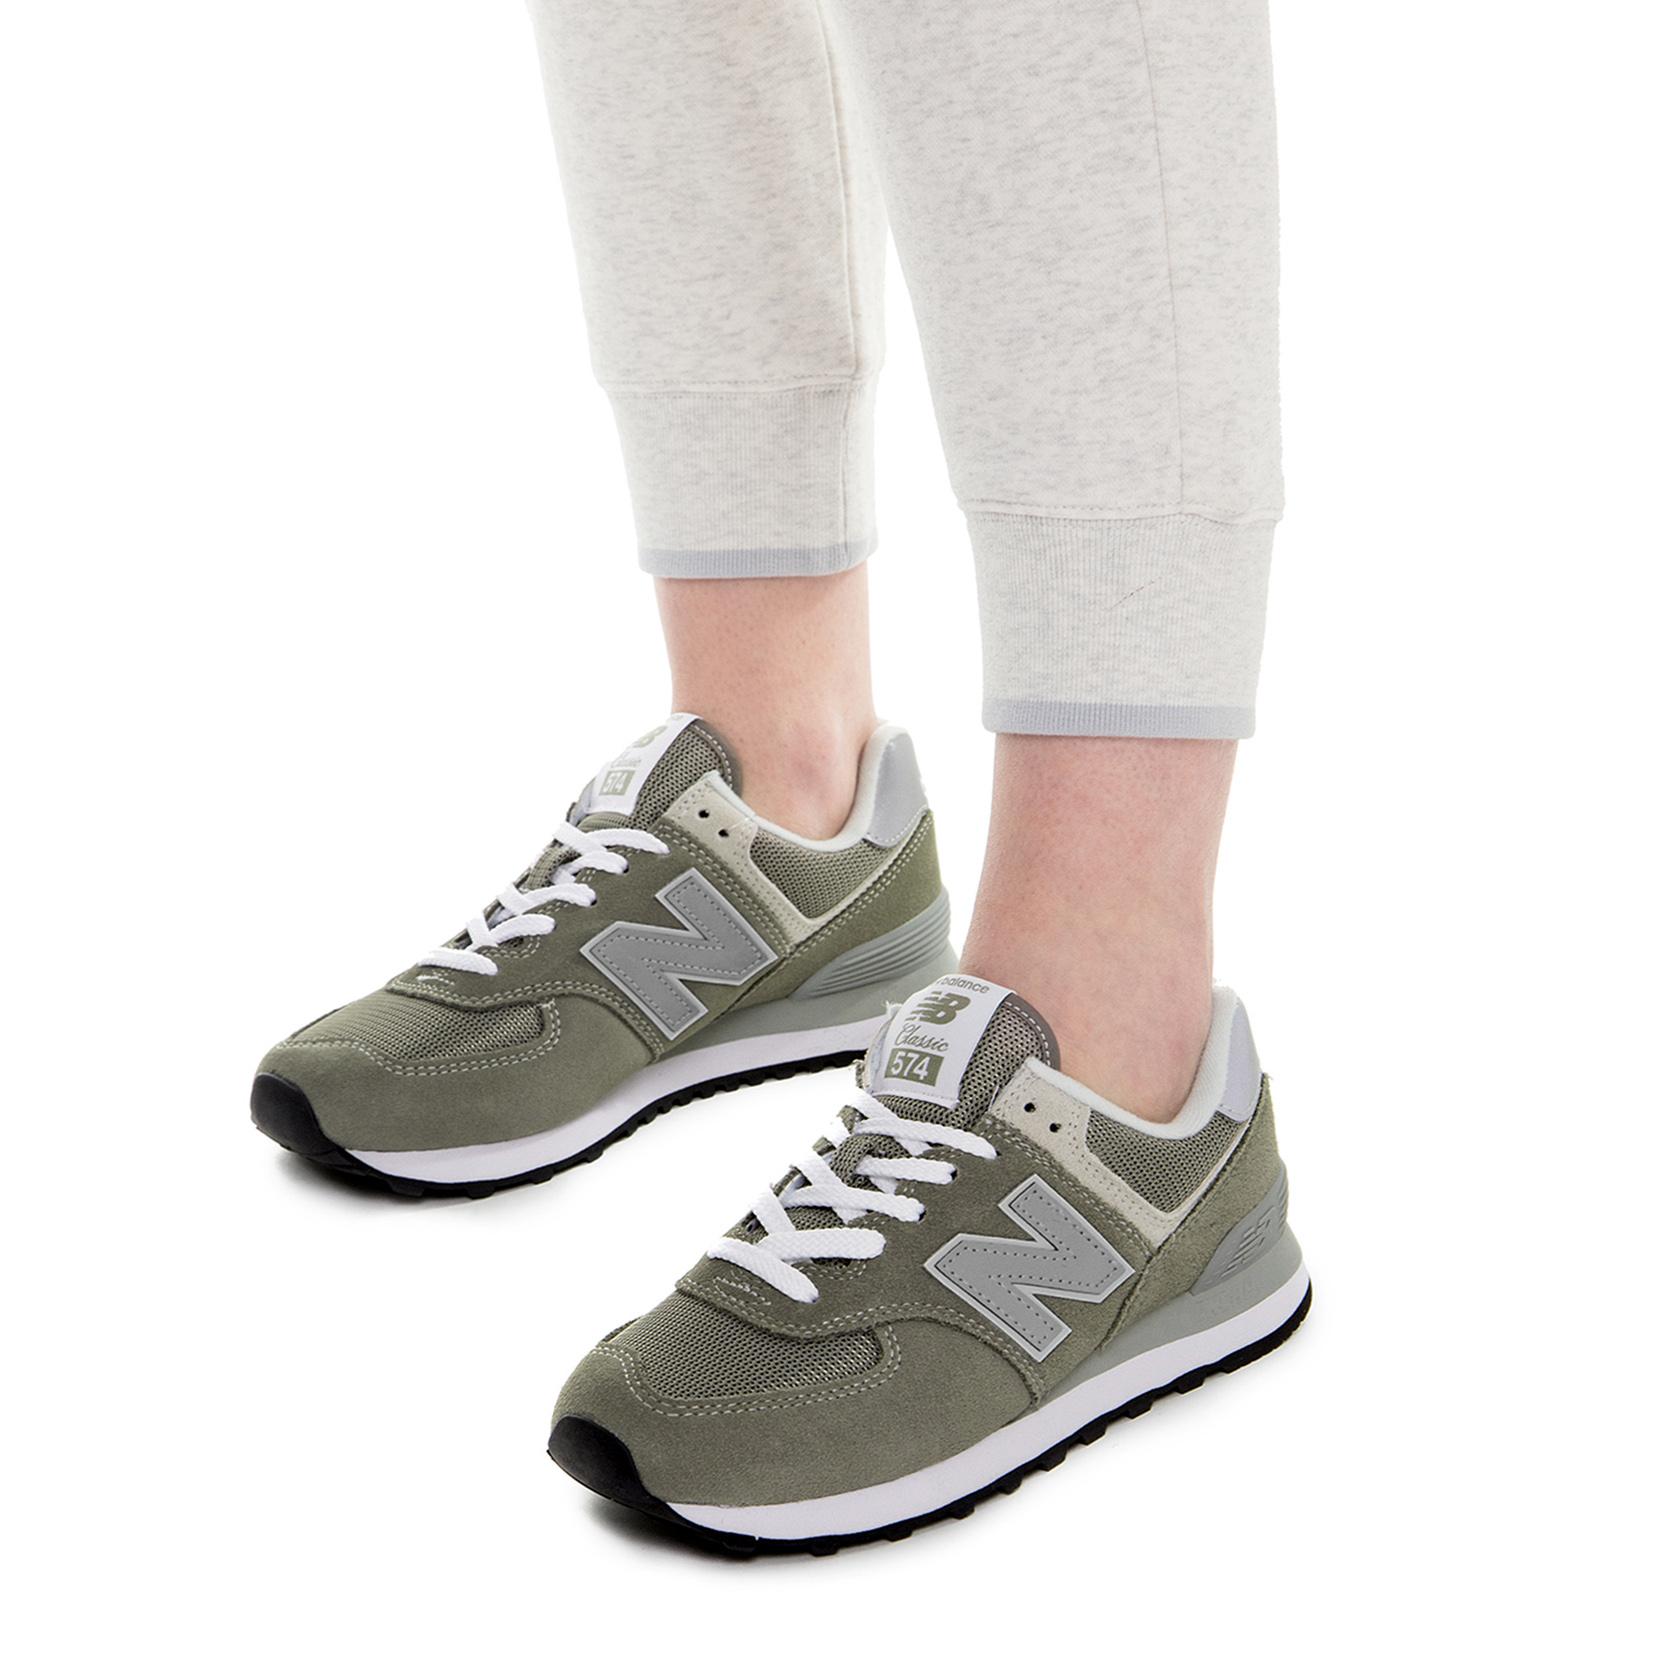 Жіноче взуття повсякденне New Balance 574 Classic  WL574EG | New Balance